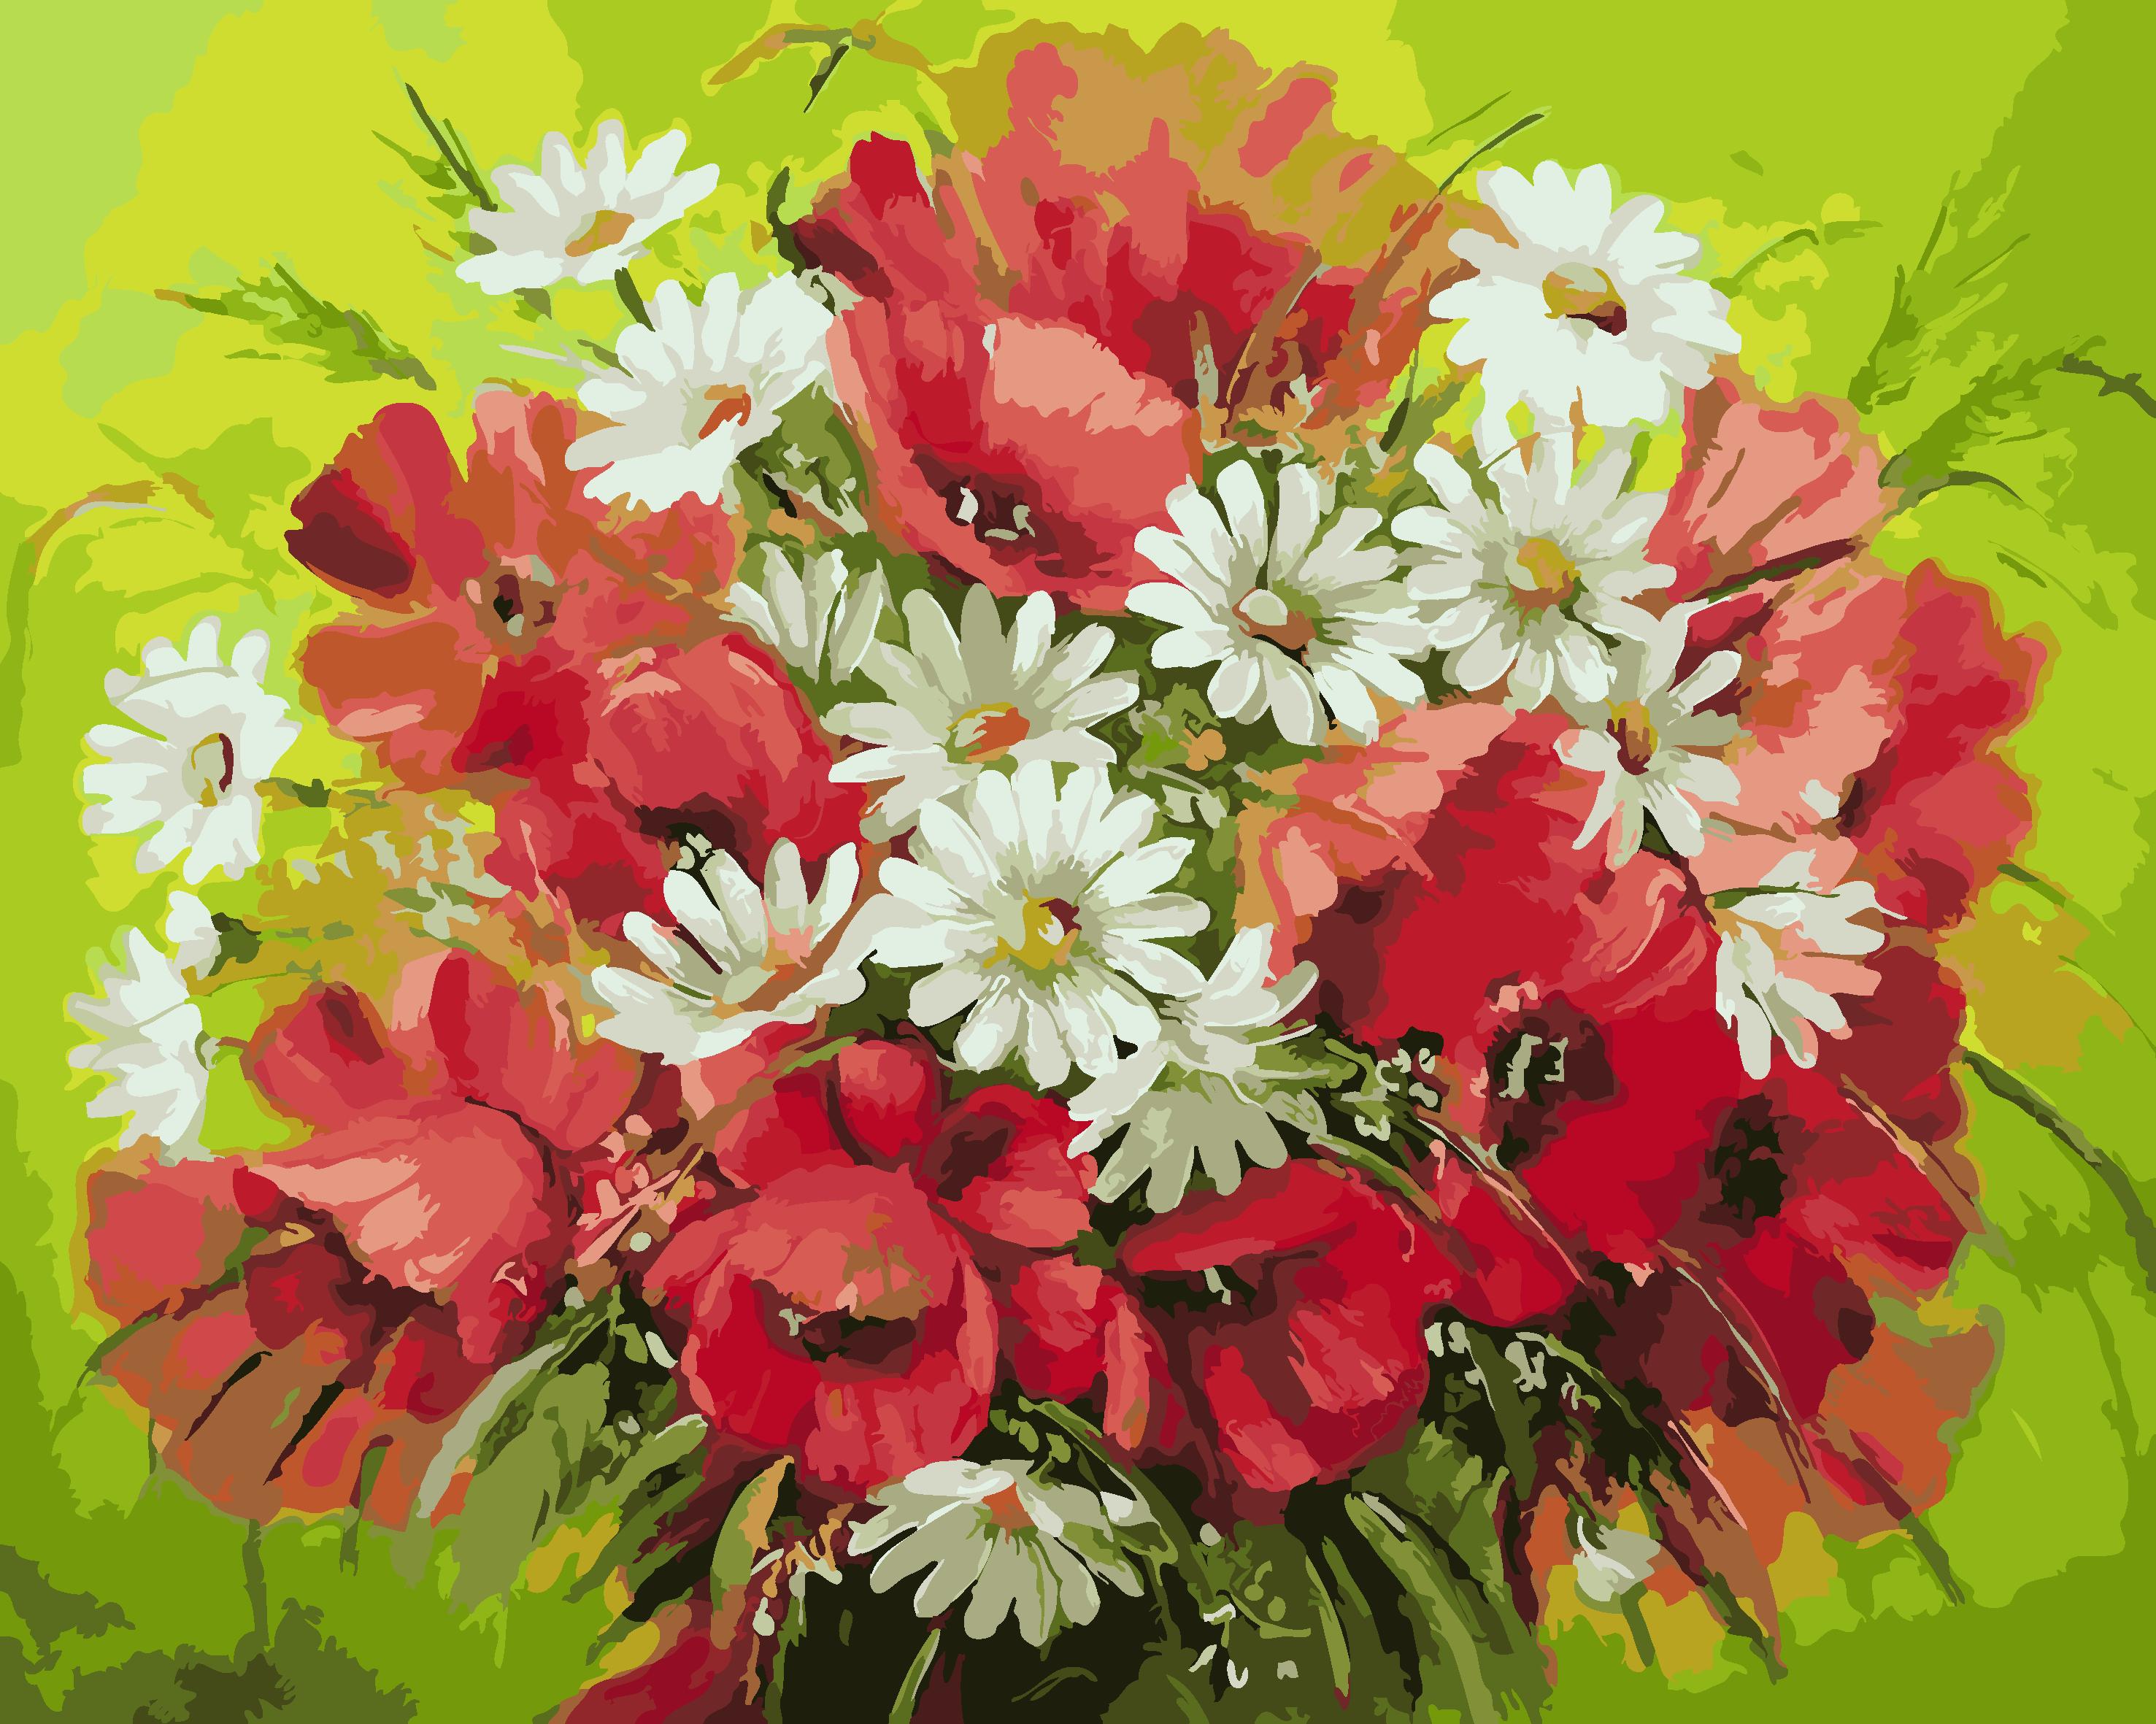 Poppy Flowers Acrylic Paint Crafts Digital Oil Painting Frameless